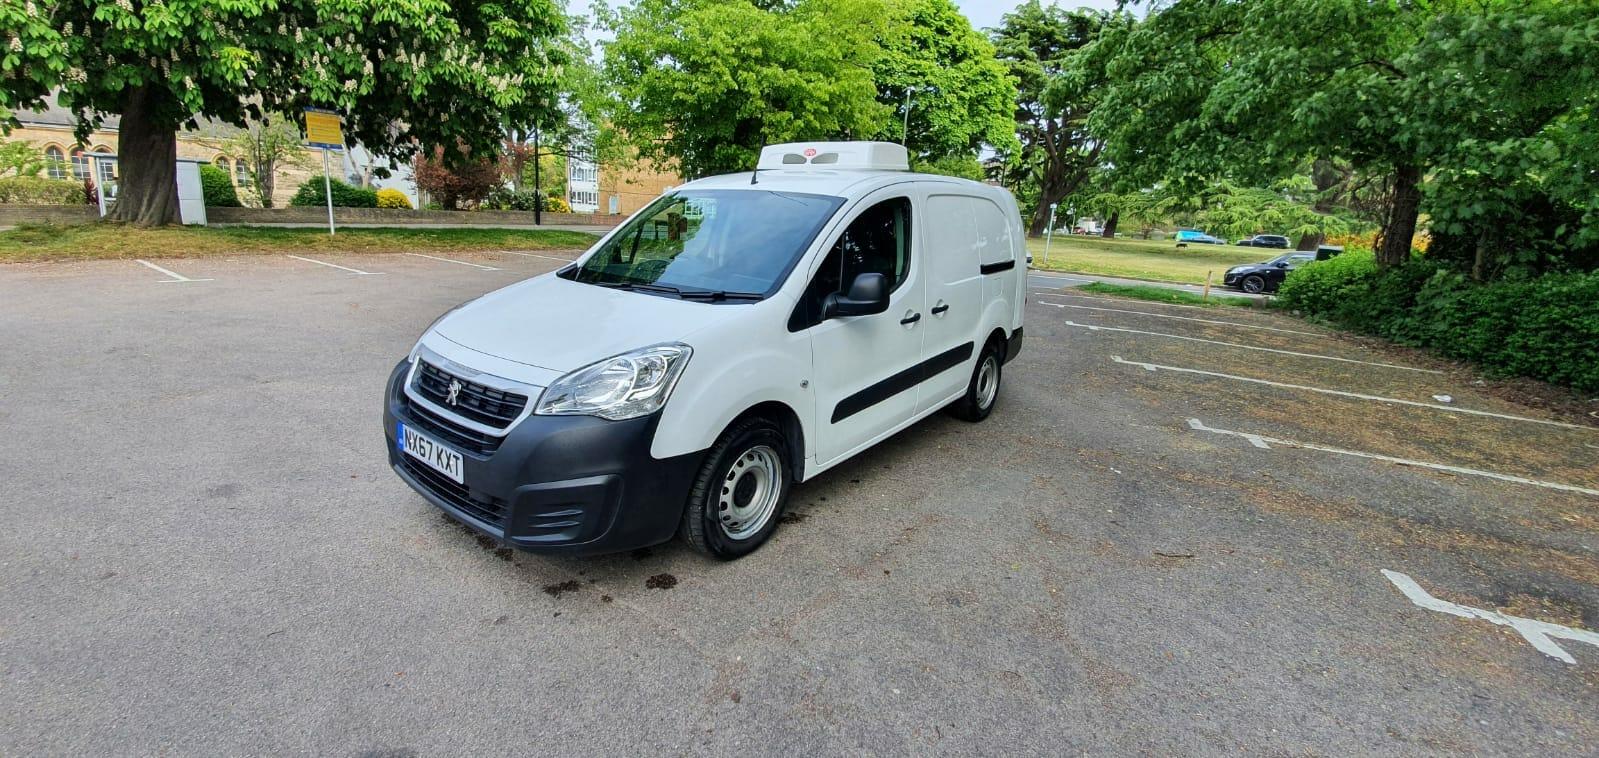 2017 Peugeot Partner 750 L2 H1 LWB Fridge Van For Sale